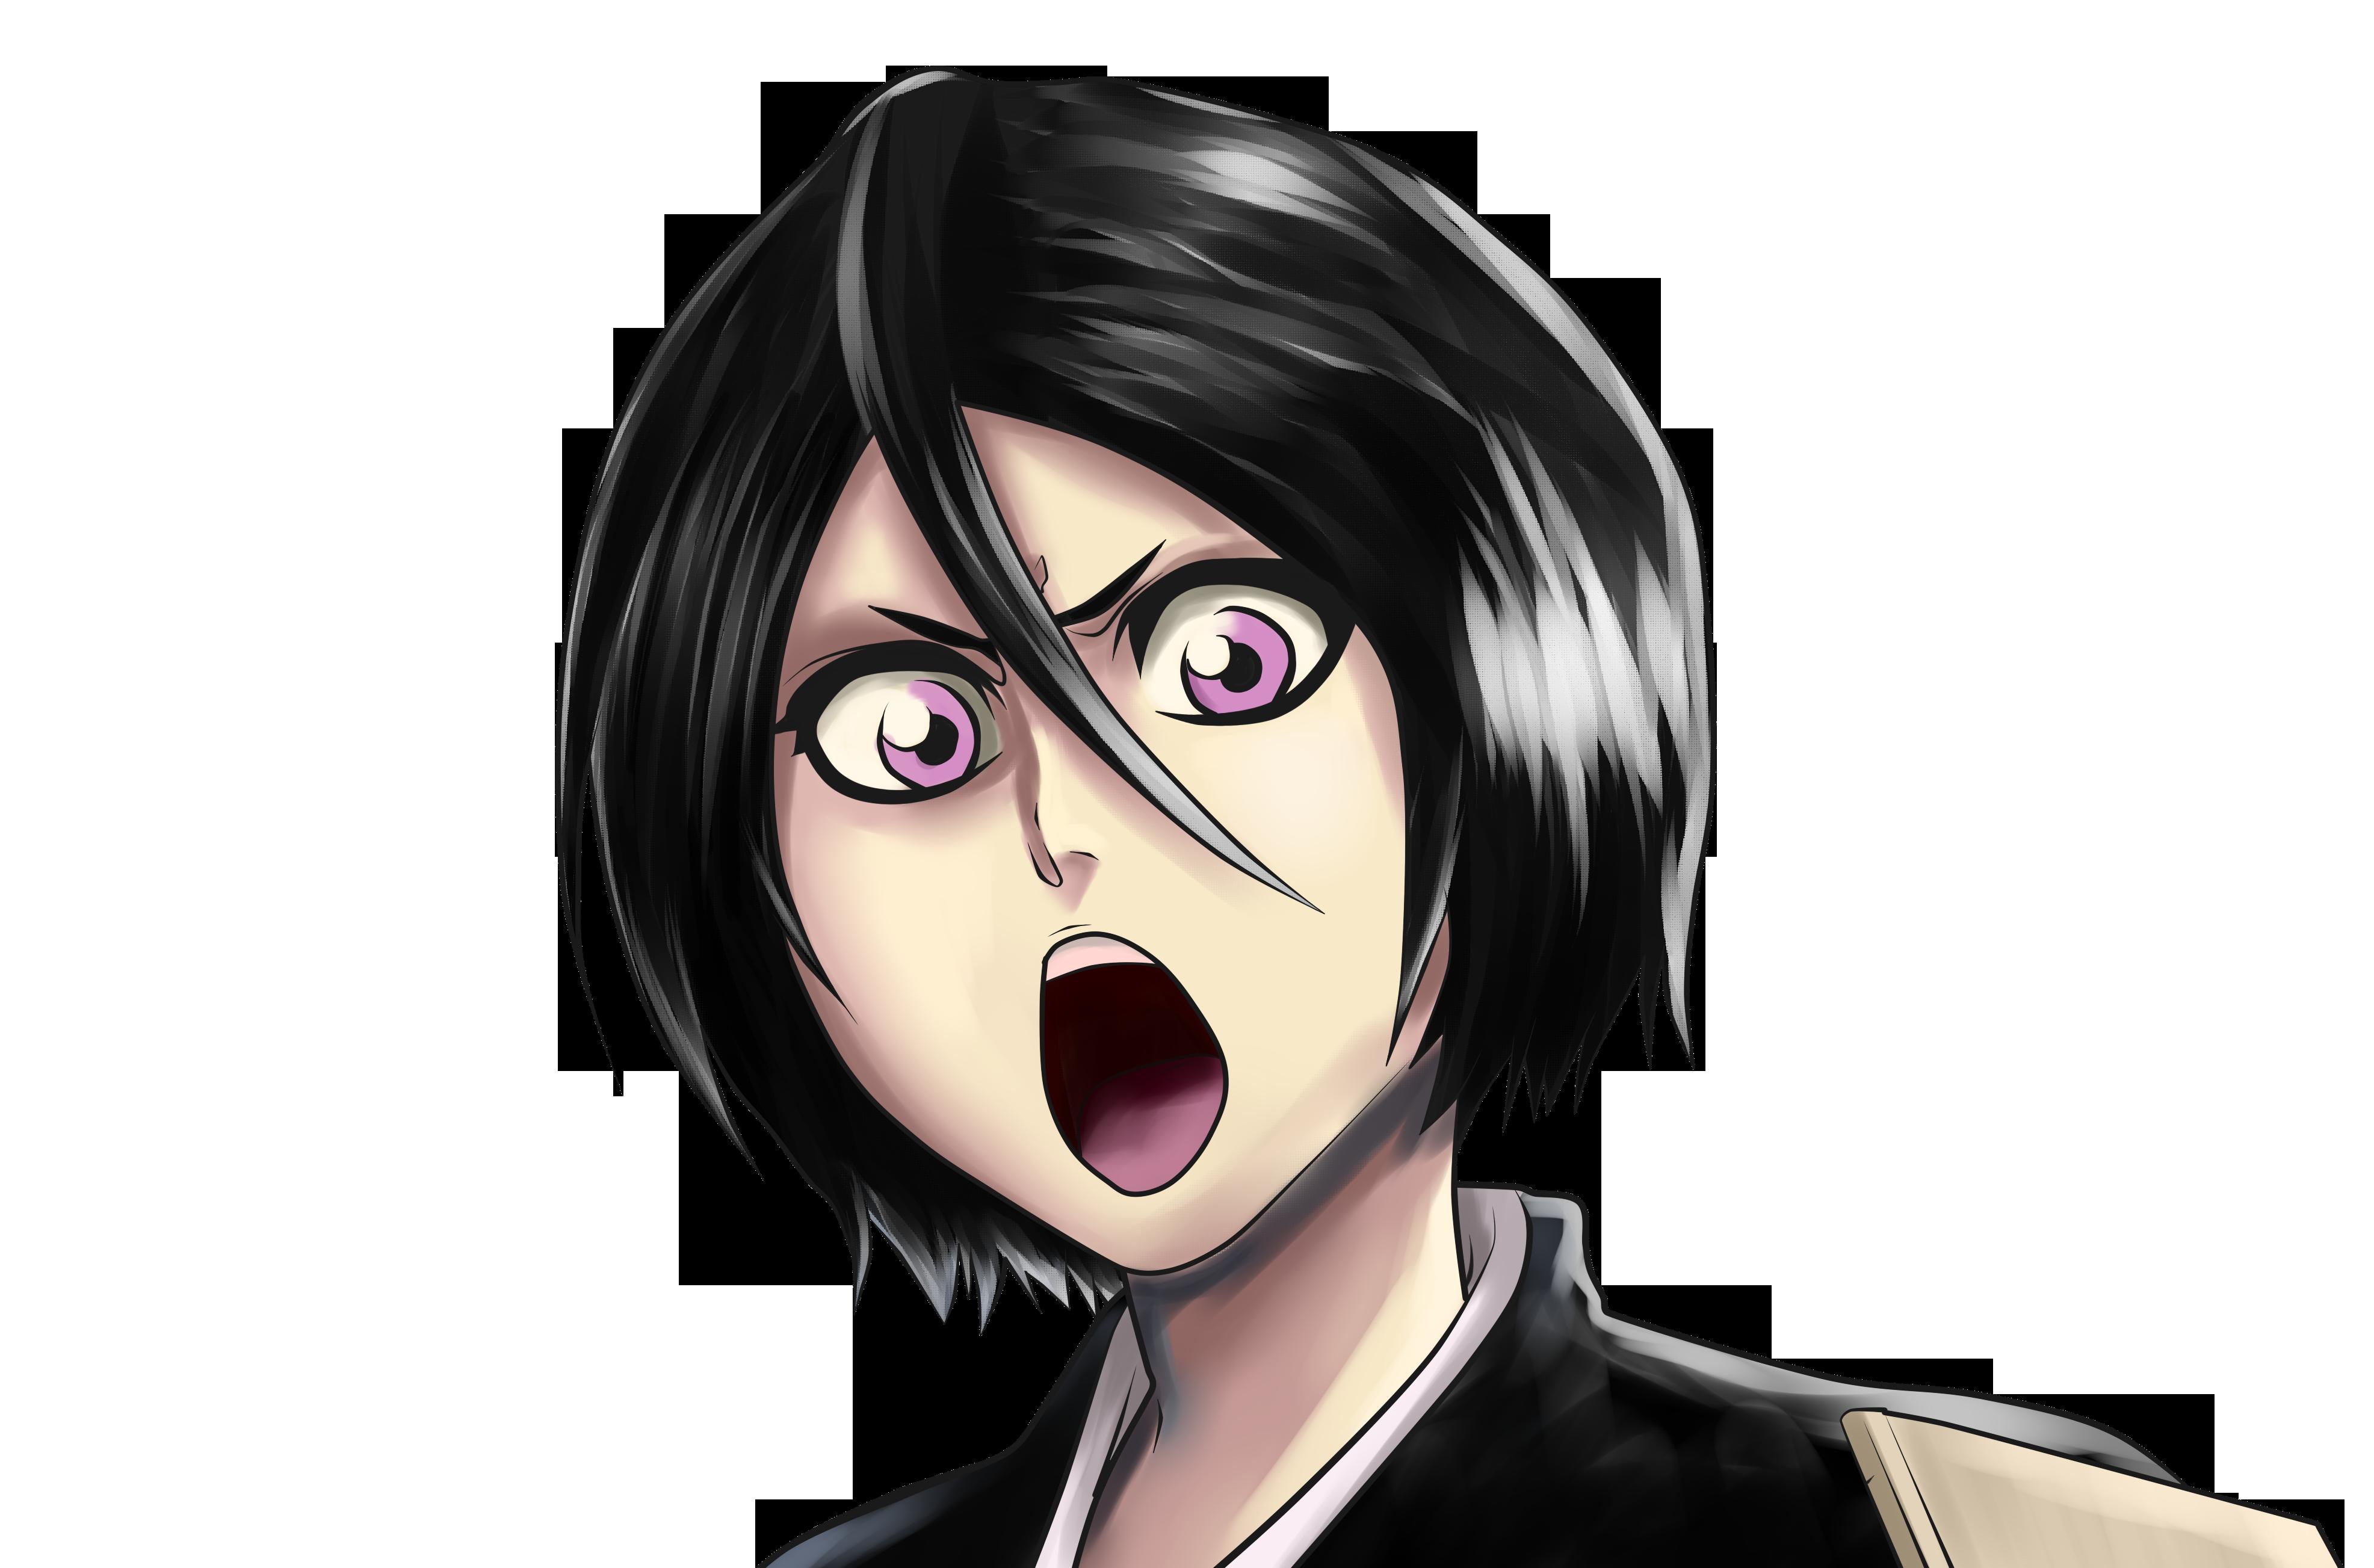 Rukia Kuchiki [APPROVED, 0-4+ -Kyle] Rukia_render_by_chidorisanin-d46yfzz